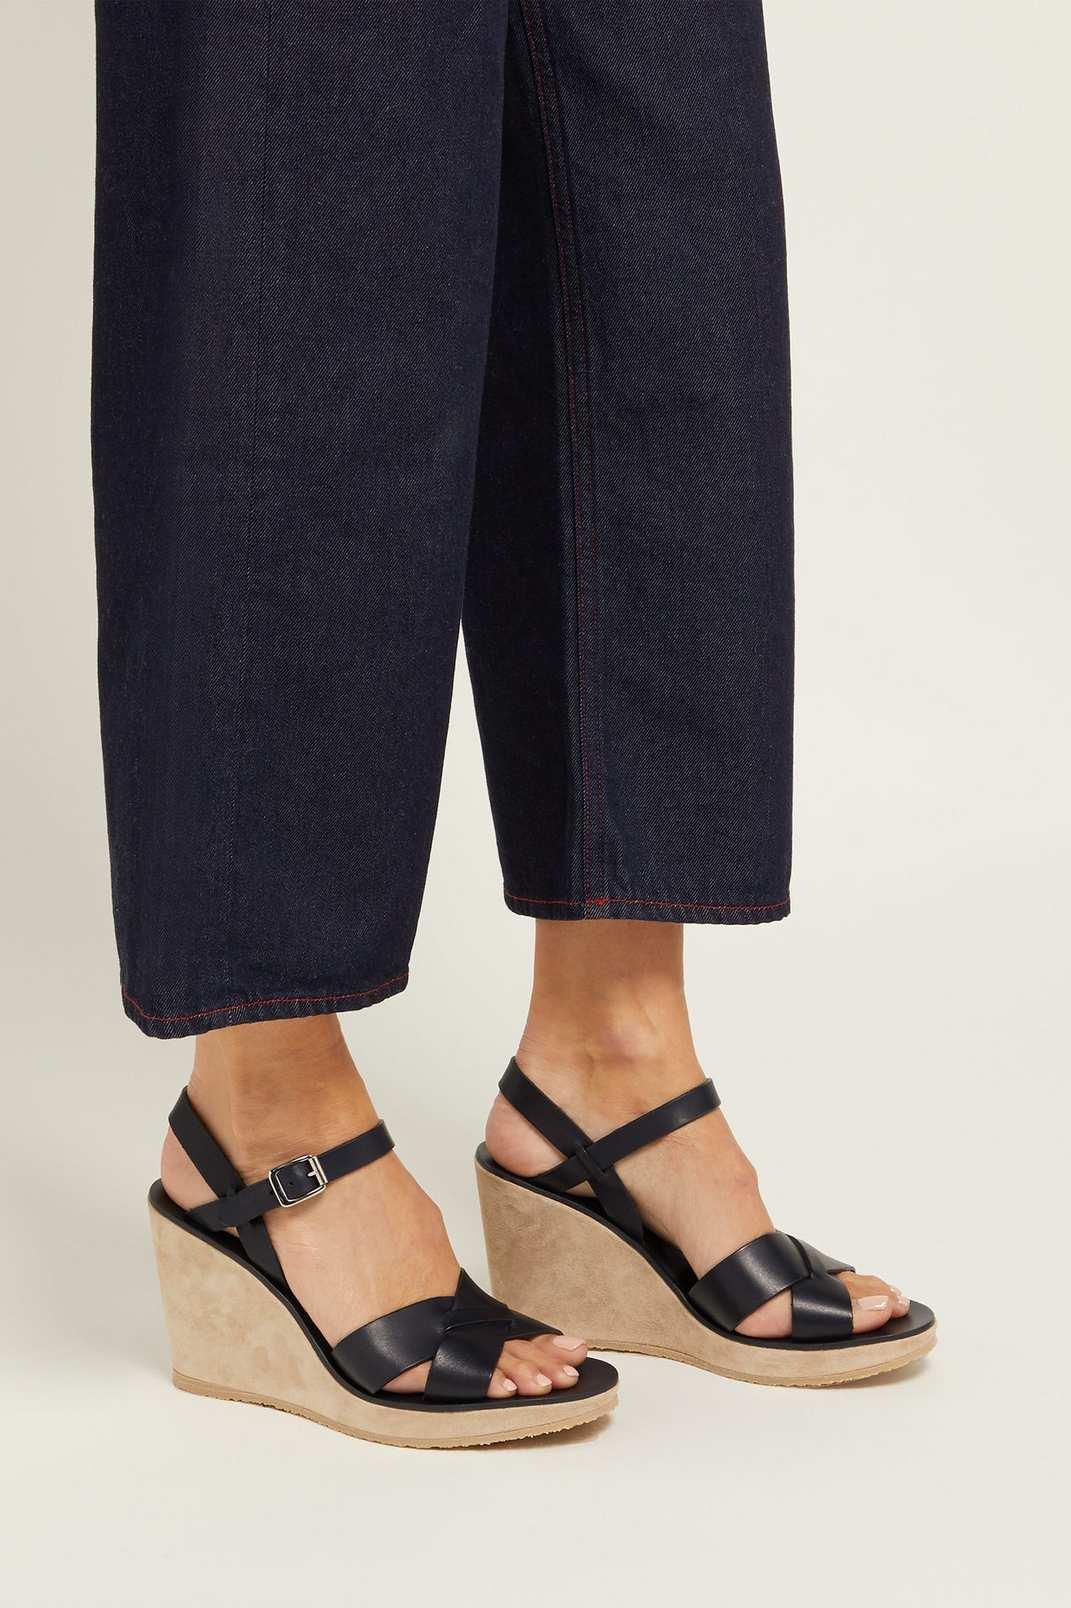 A.P.C. Juliette Leather Wedge Sandals